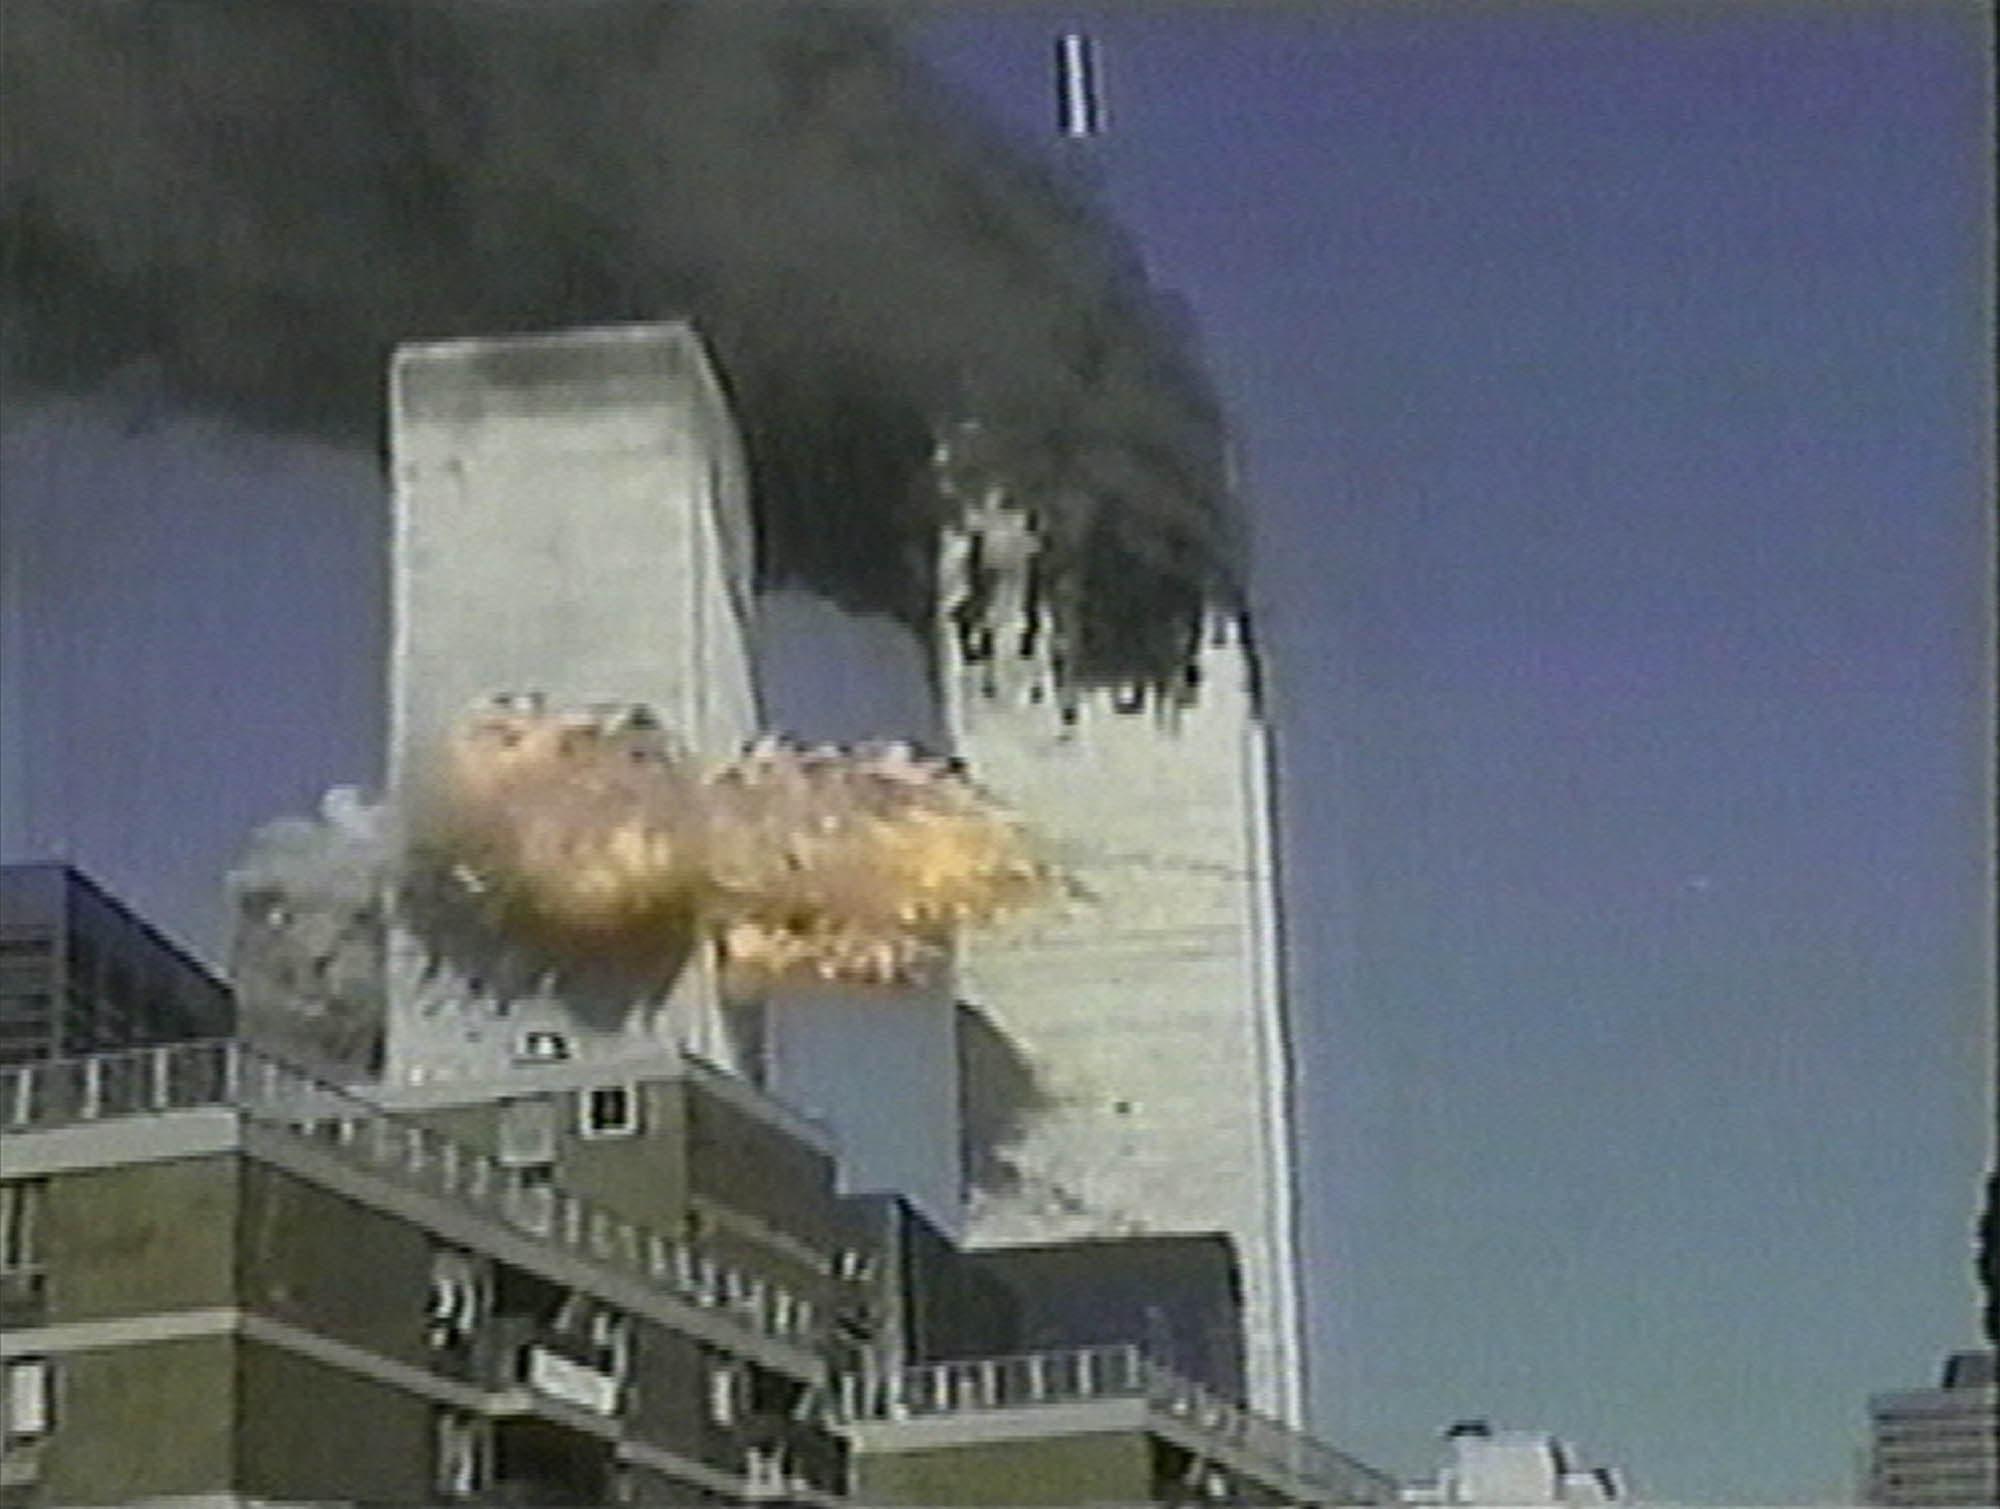 Der 11. September 2001: Zwei Passagierflugzeuge fliegen in die «Twin Towers» in New York.